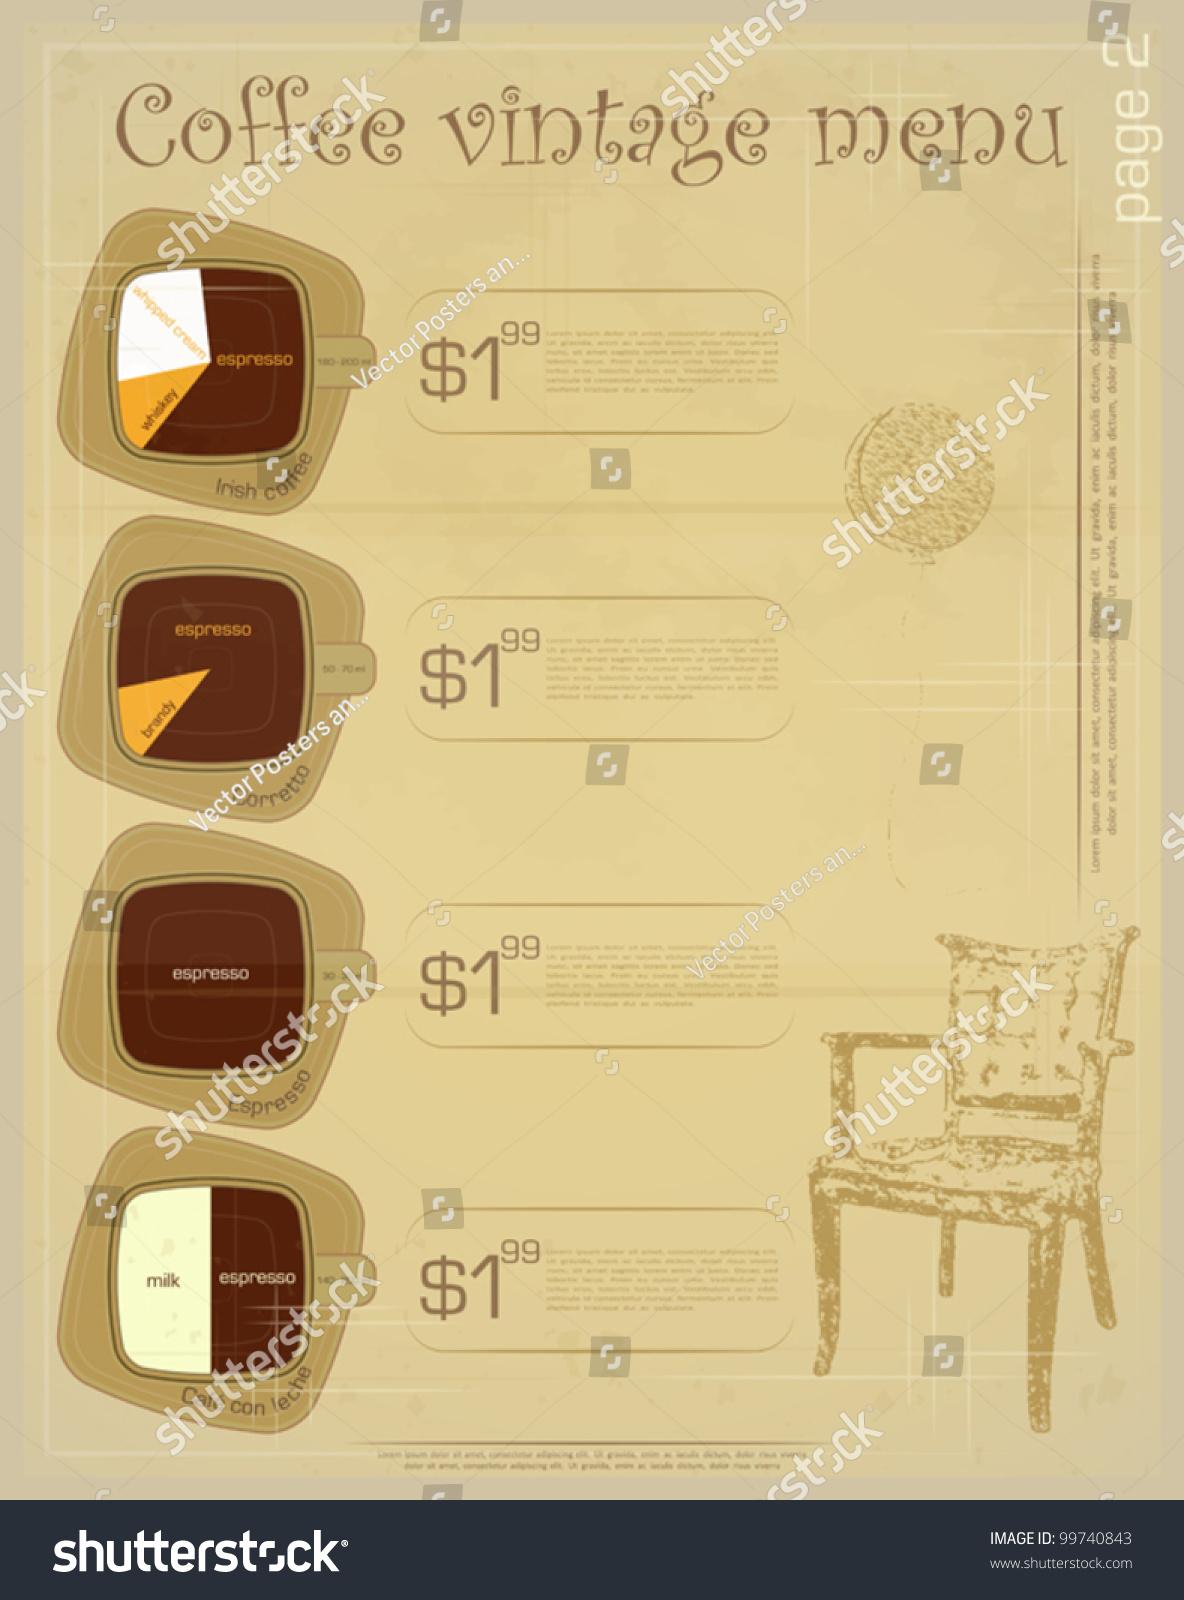 Template of menu for coffee drinks irish corretto for Irish menu templates